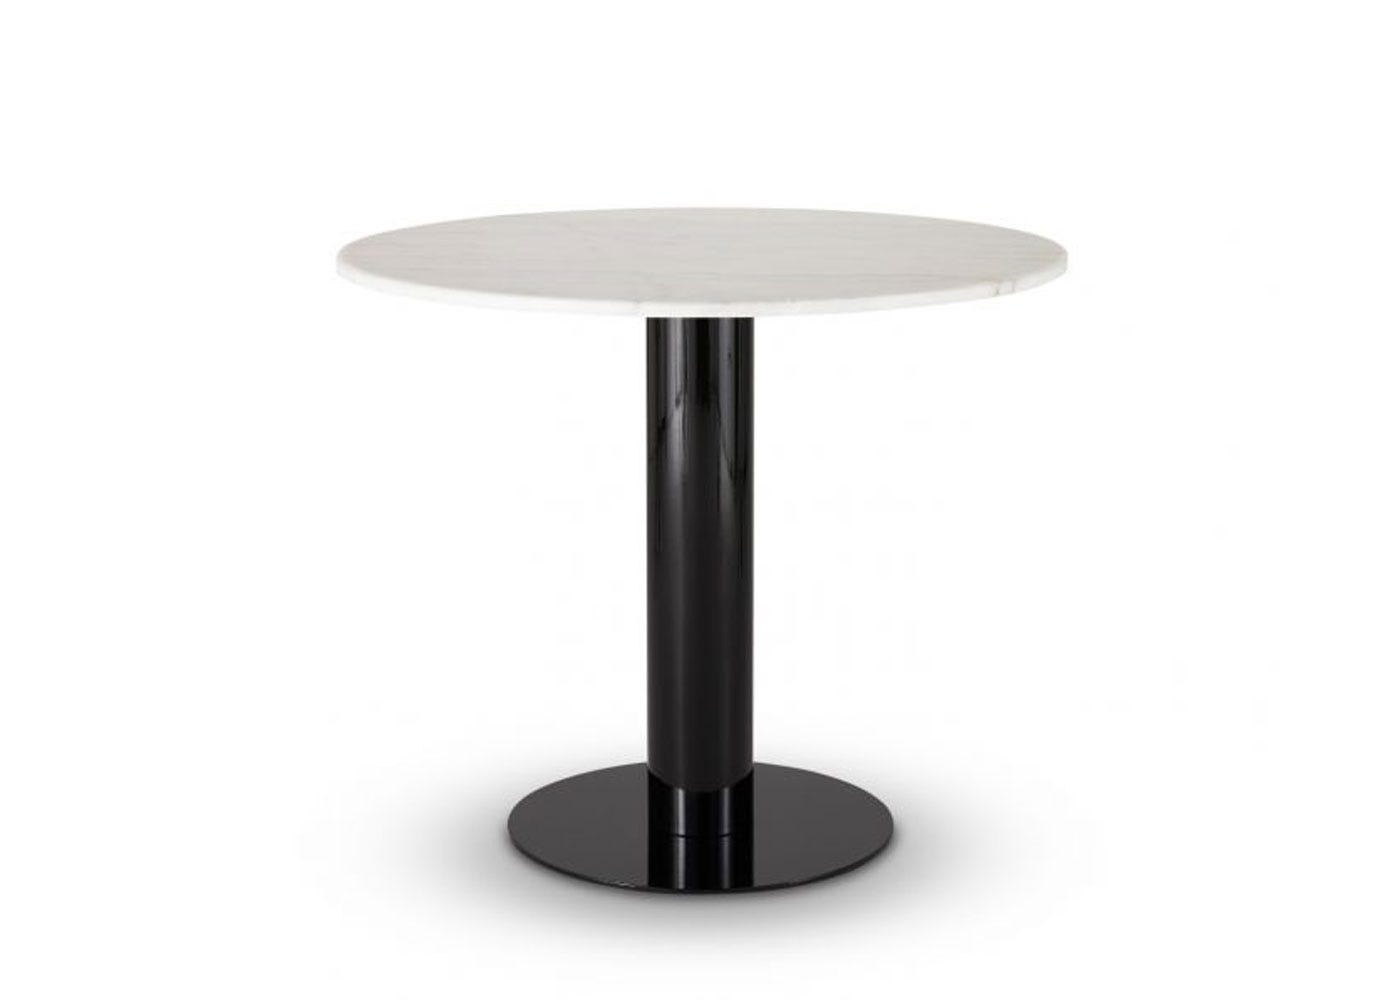 Tom Dixon Tube Dining Table Black Base White Marble Top